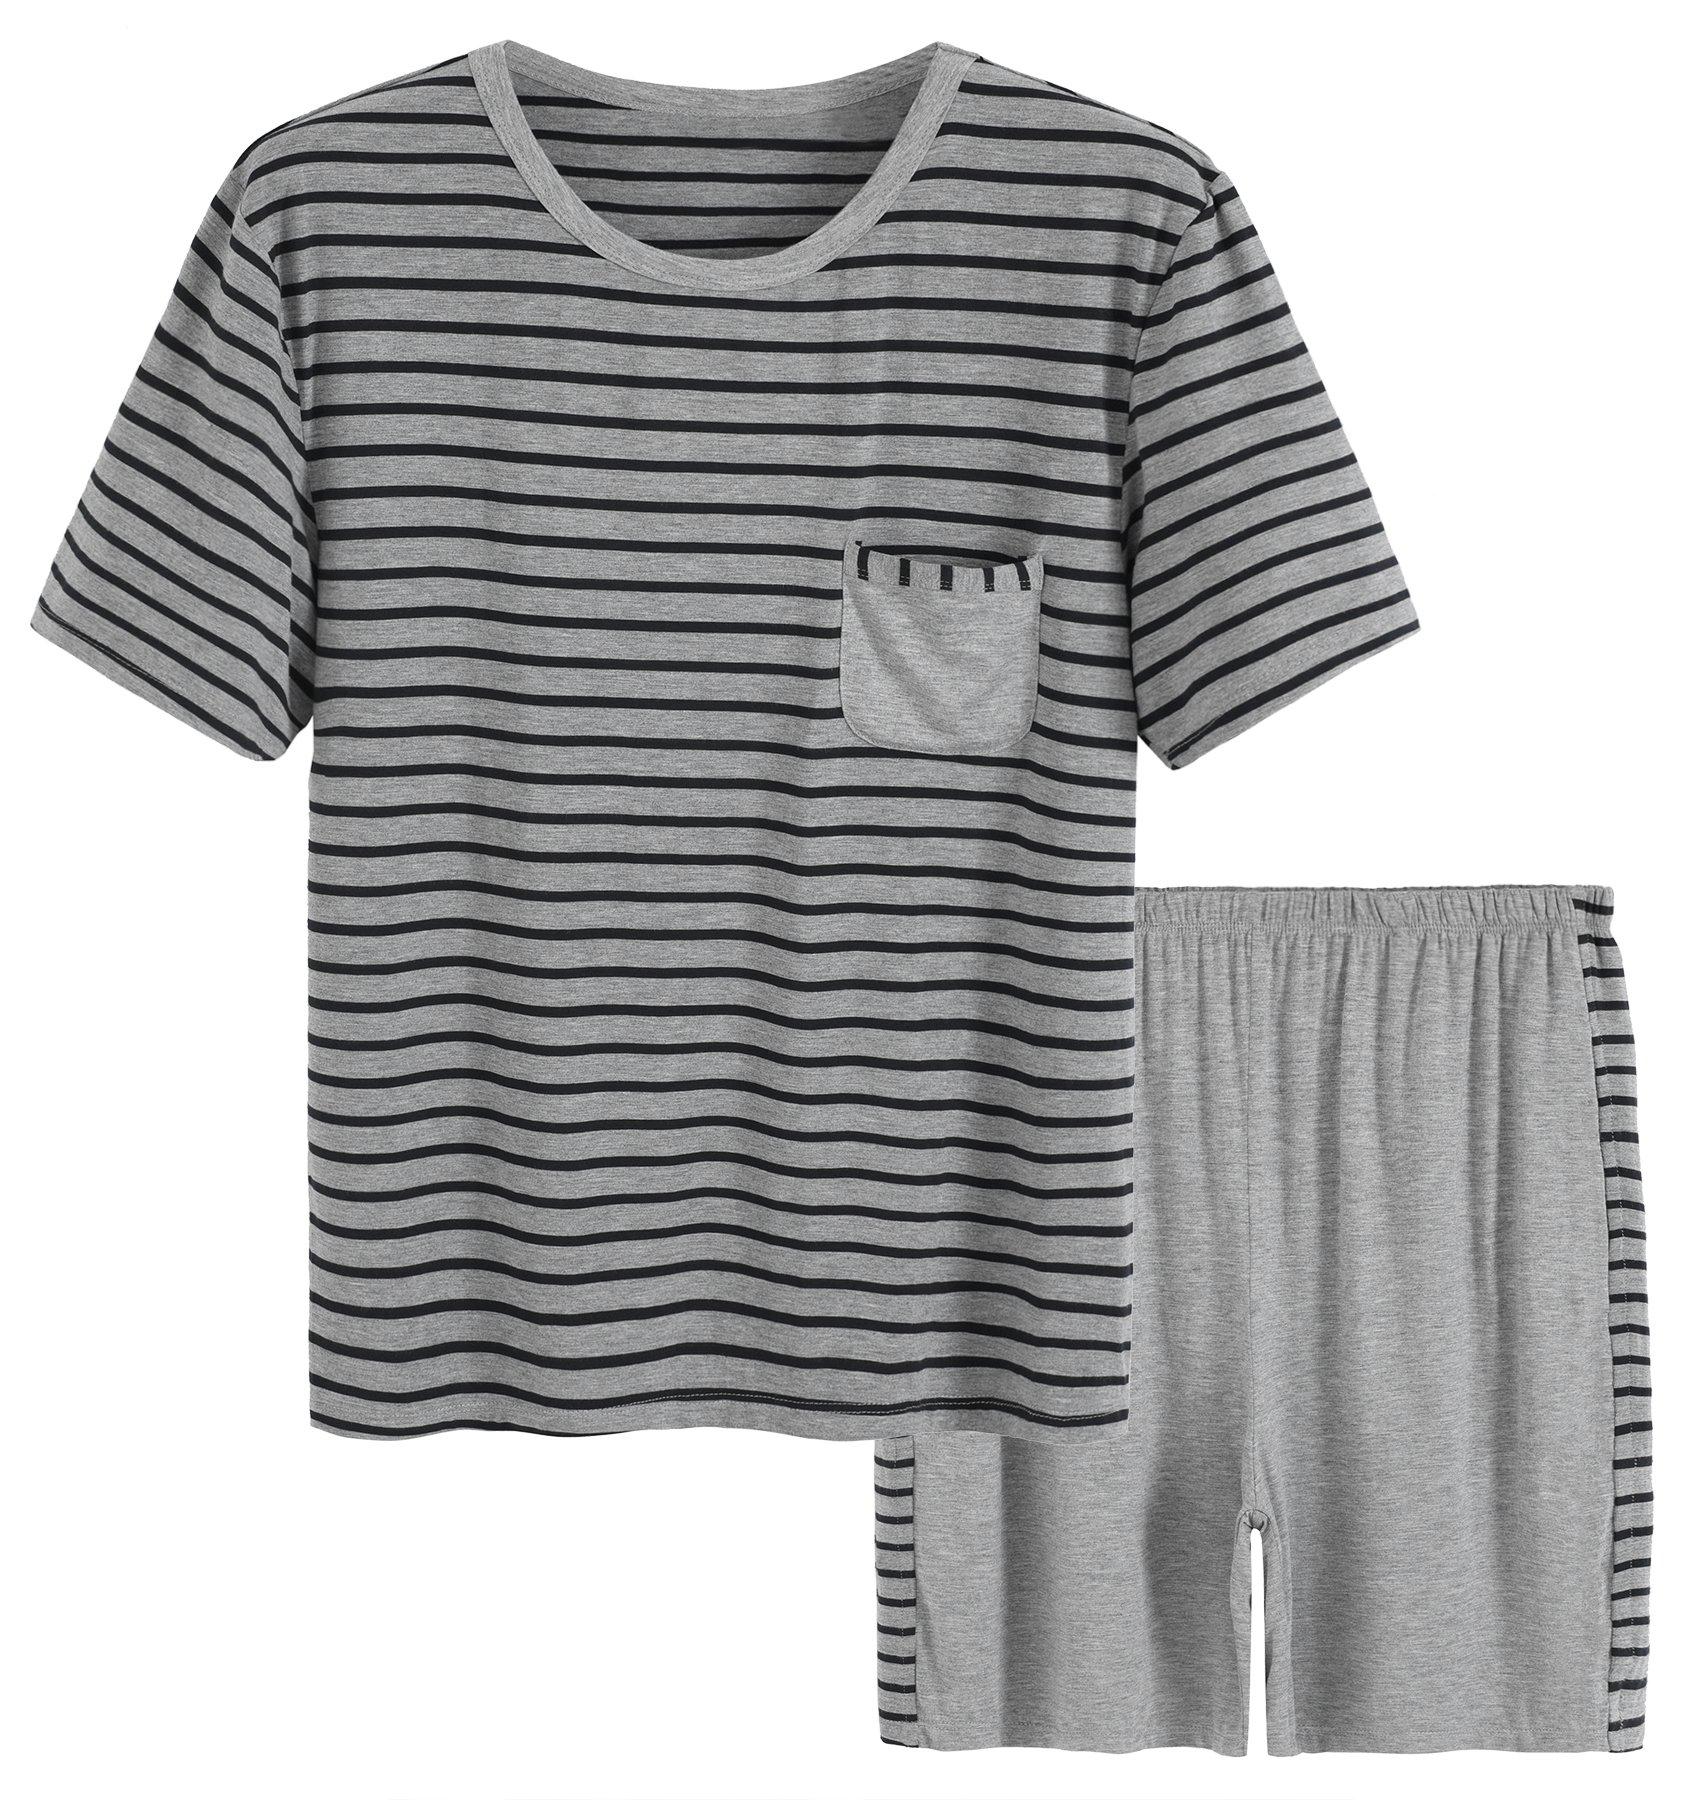 Latuza Men's Summer Sleepwear Striped Design Casual Pajama Set M Black Striped